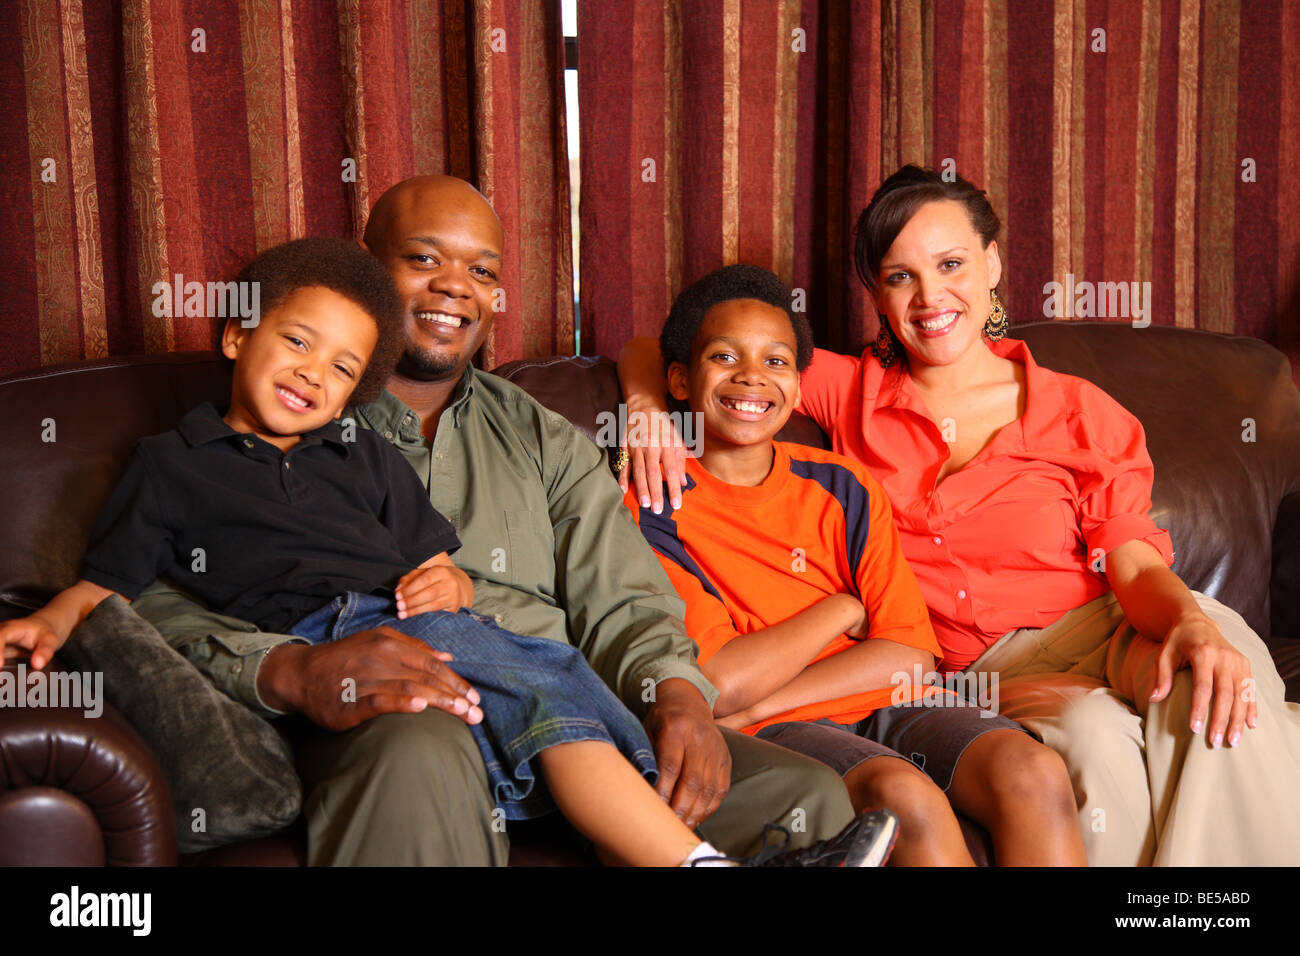 Familienfoto auf couch Stockbild